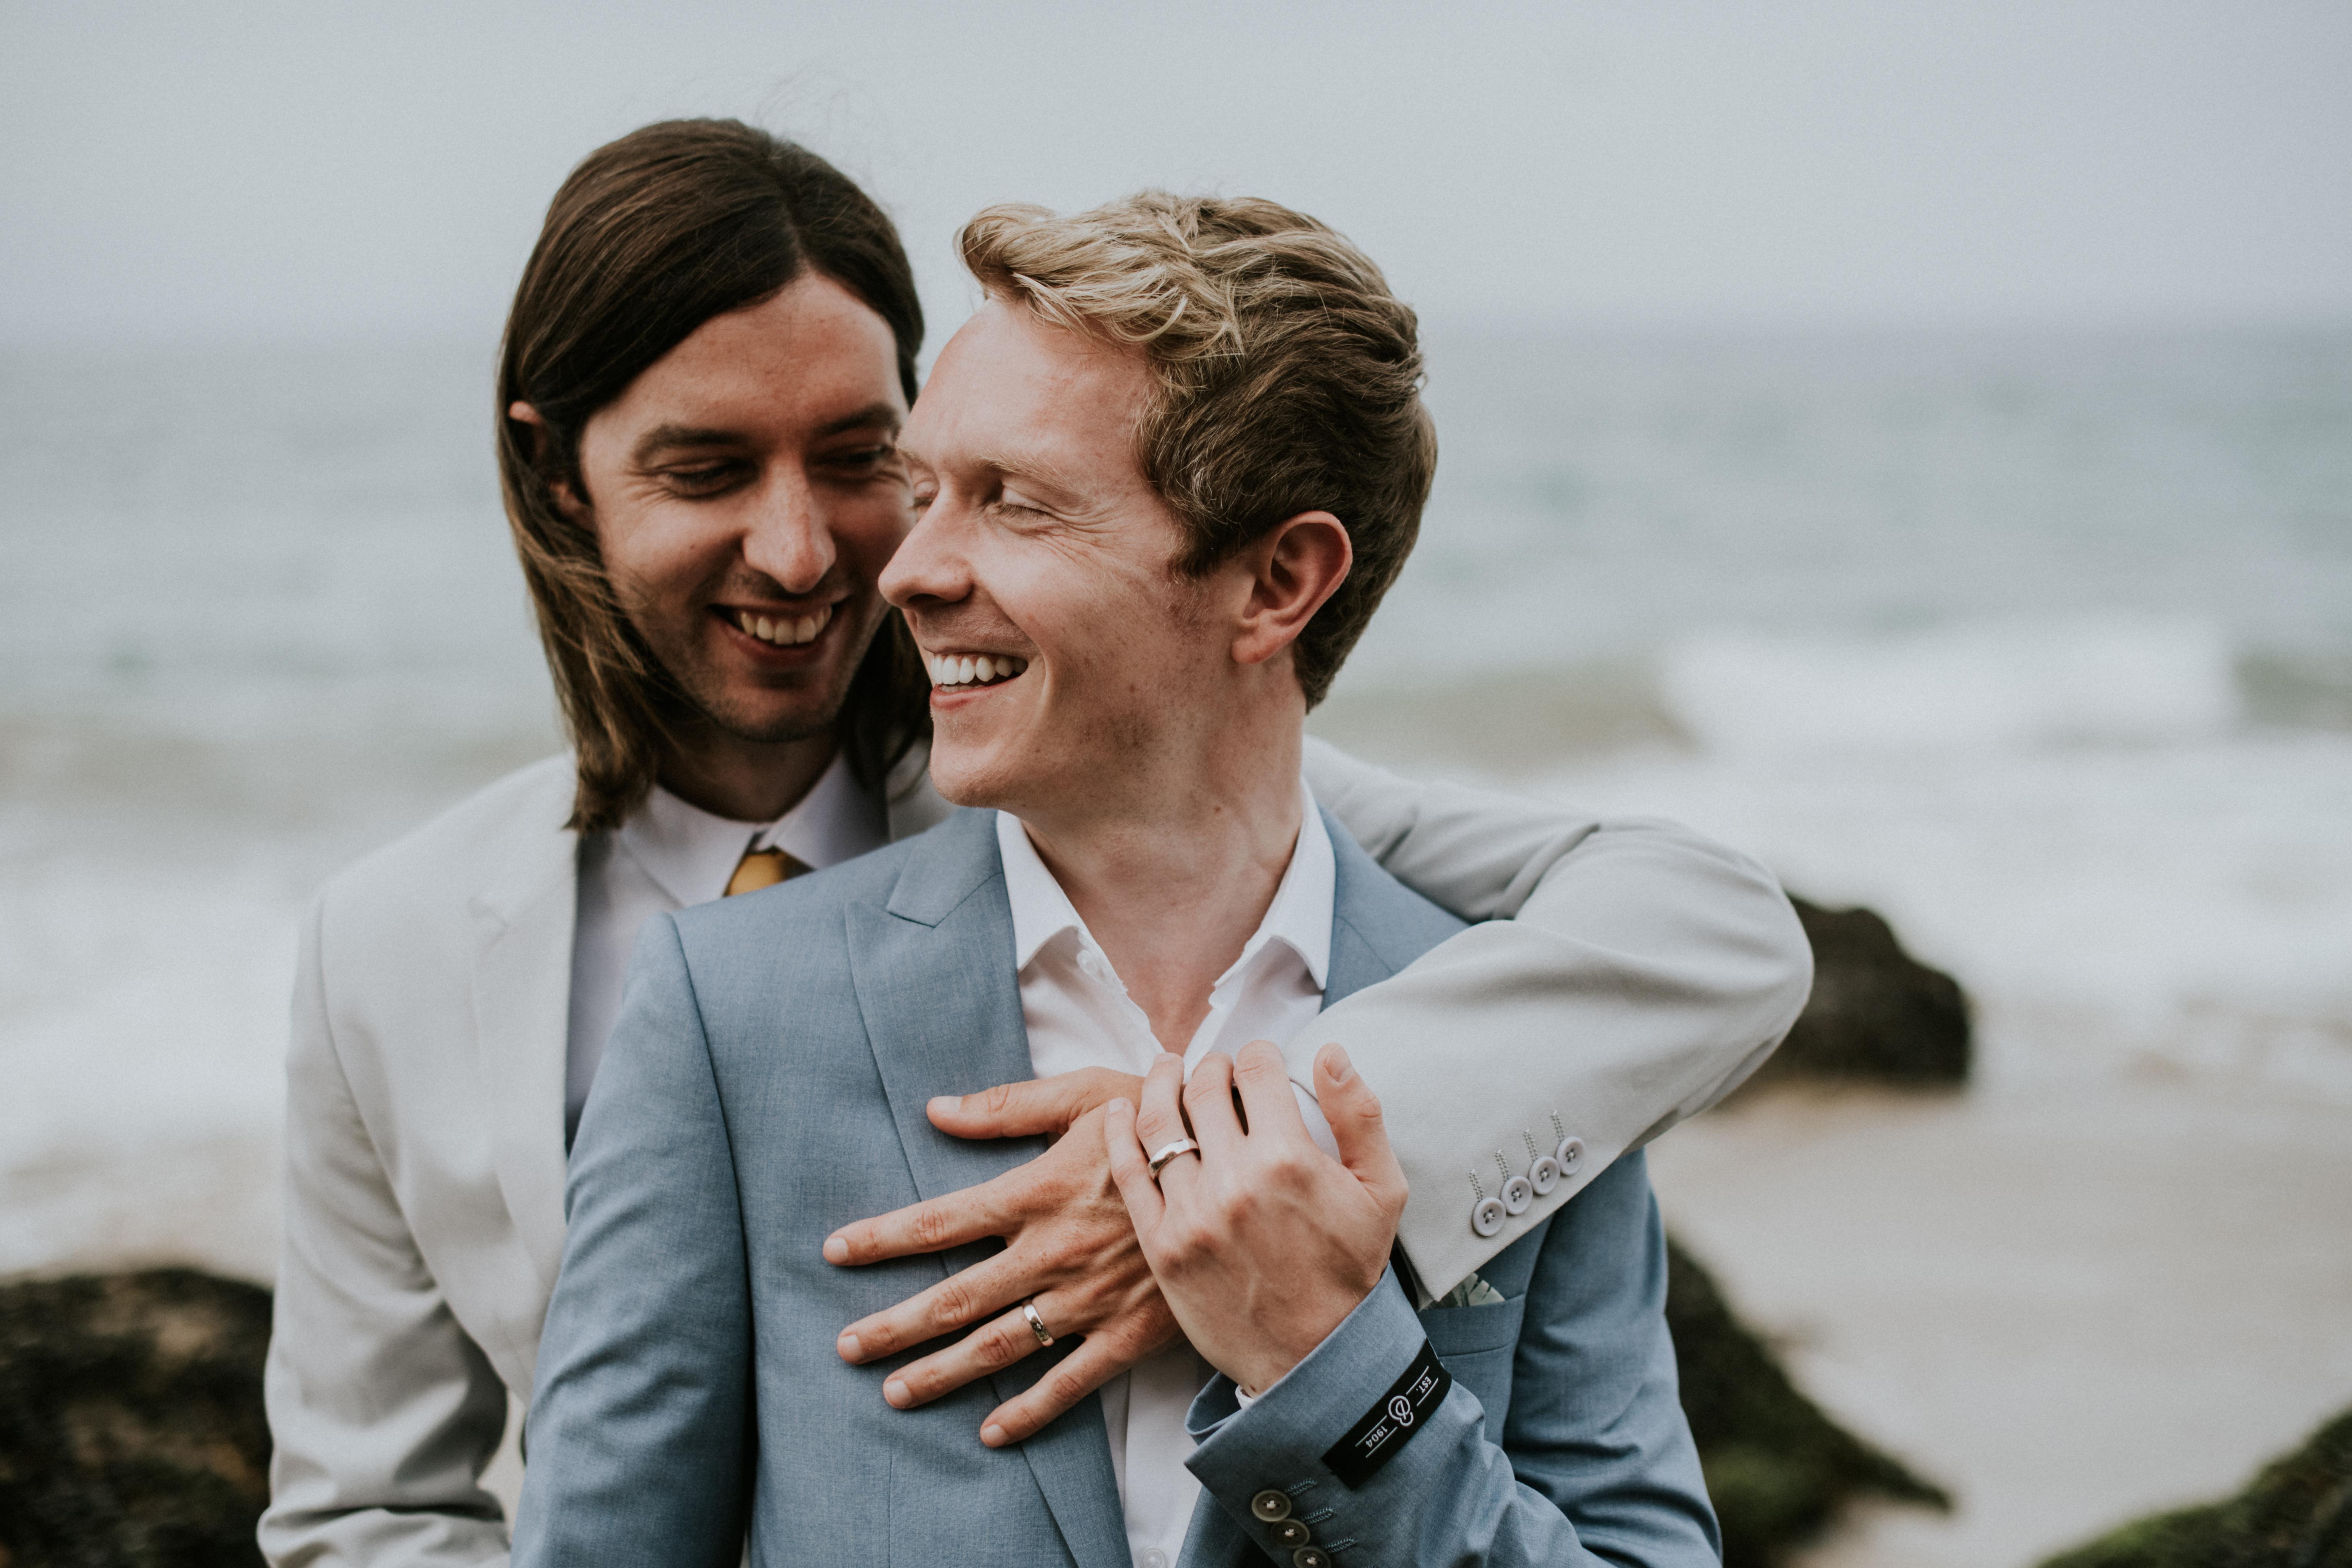 groom and groom posed on beach gay wedding photography point dume beach malibu california